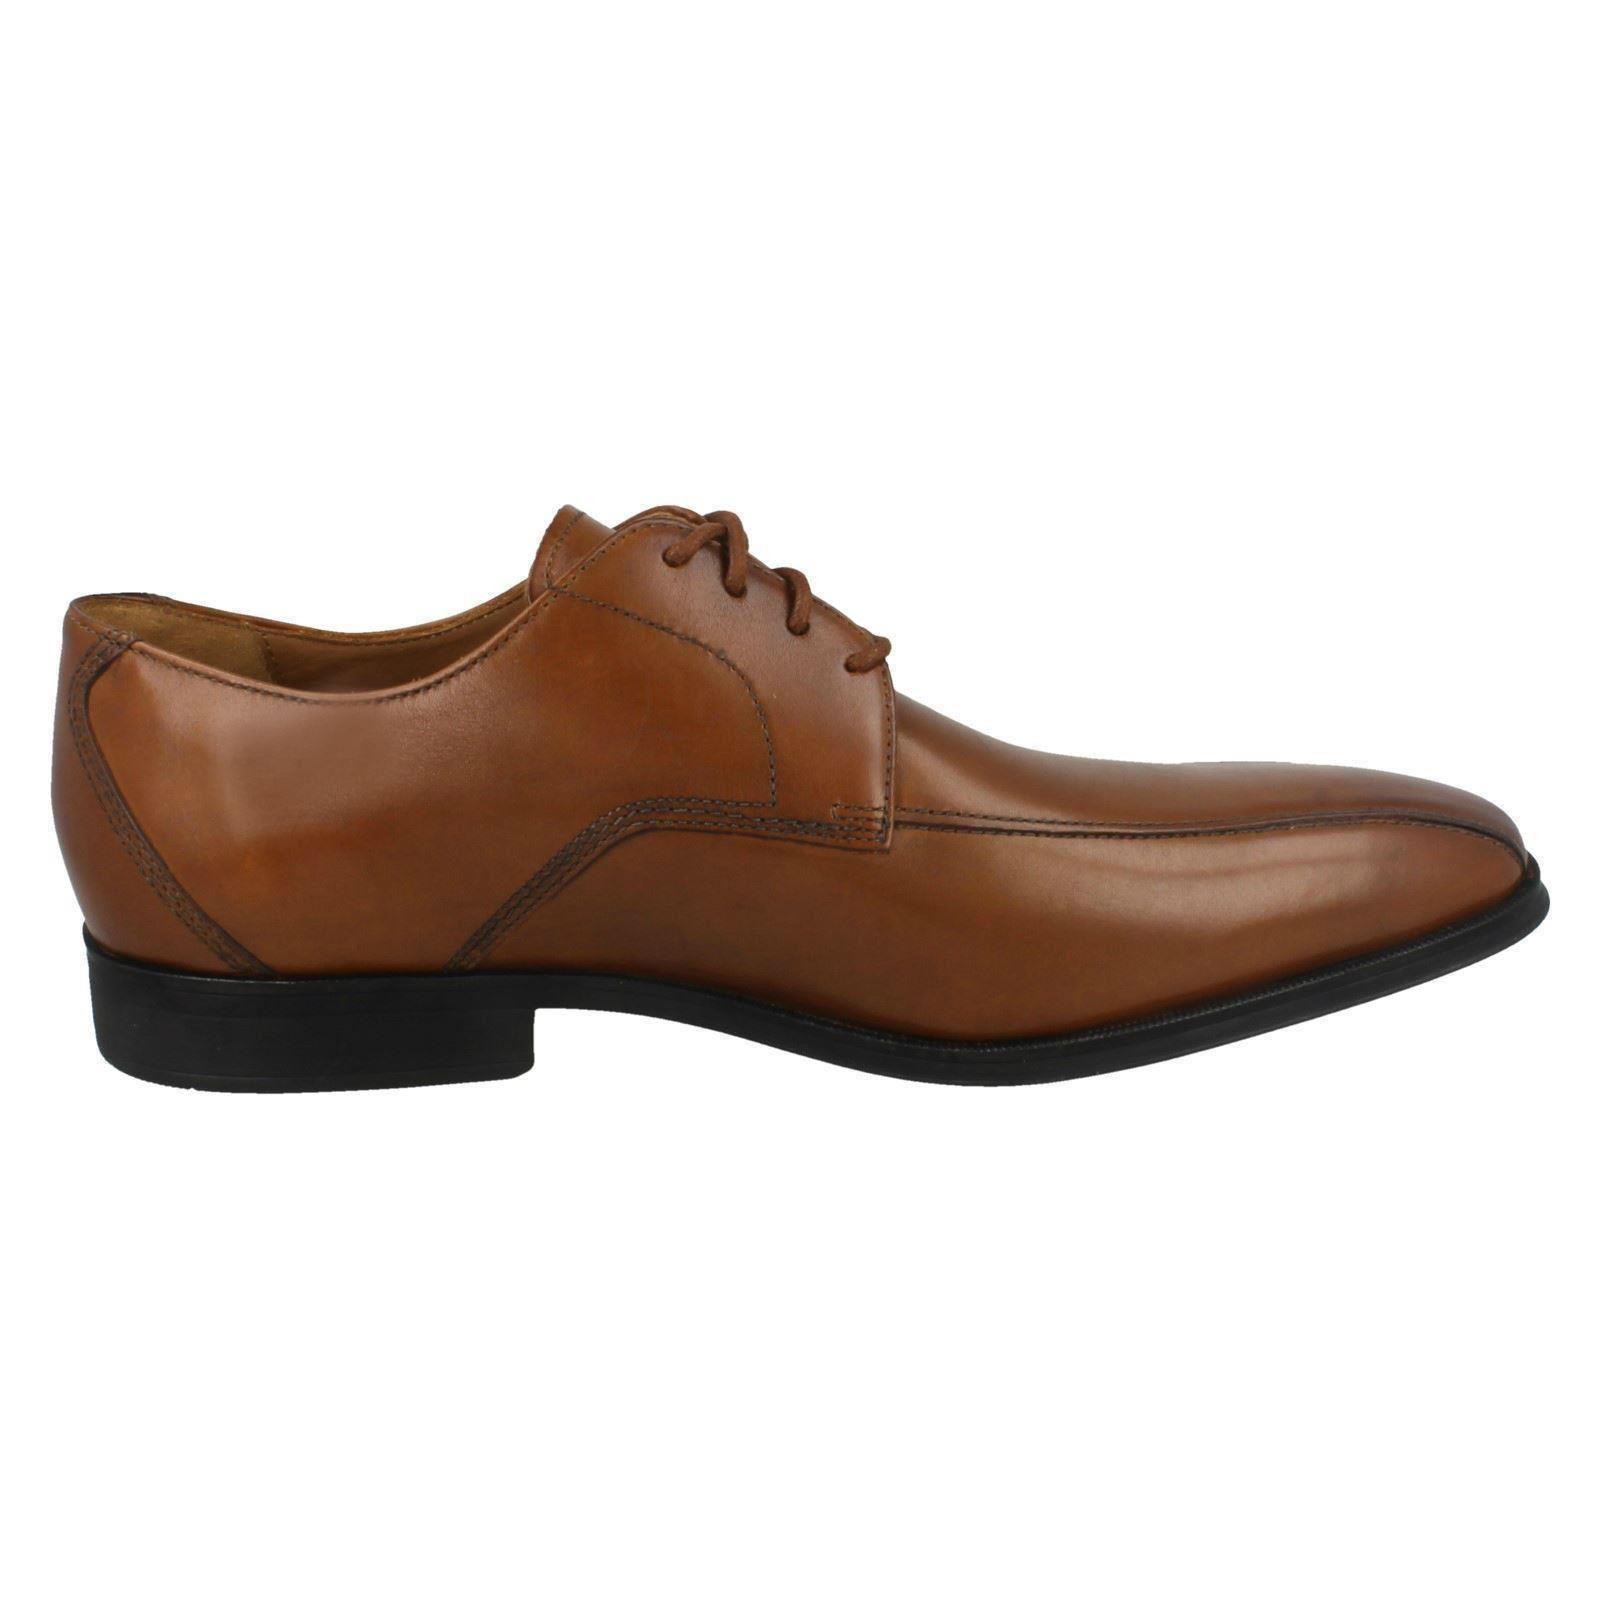 Clarks Mens Formal Shoes Gilman Mode